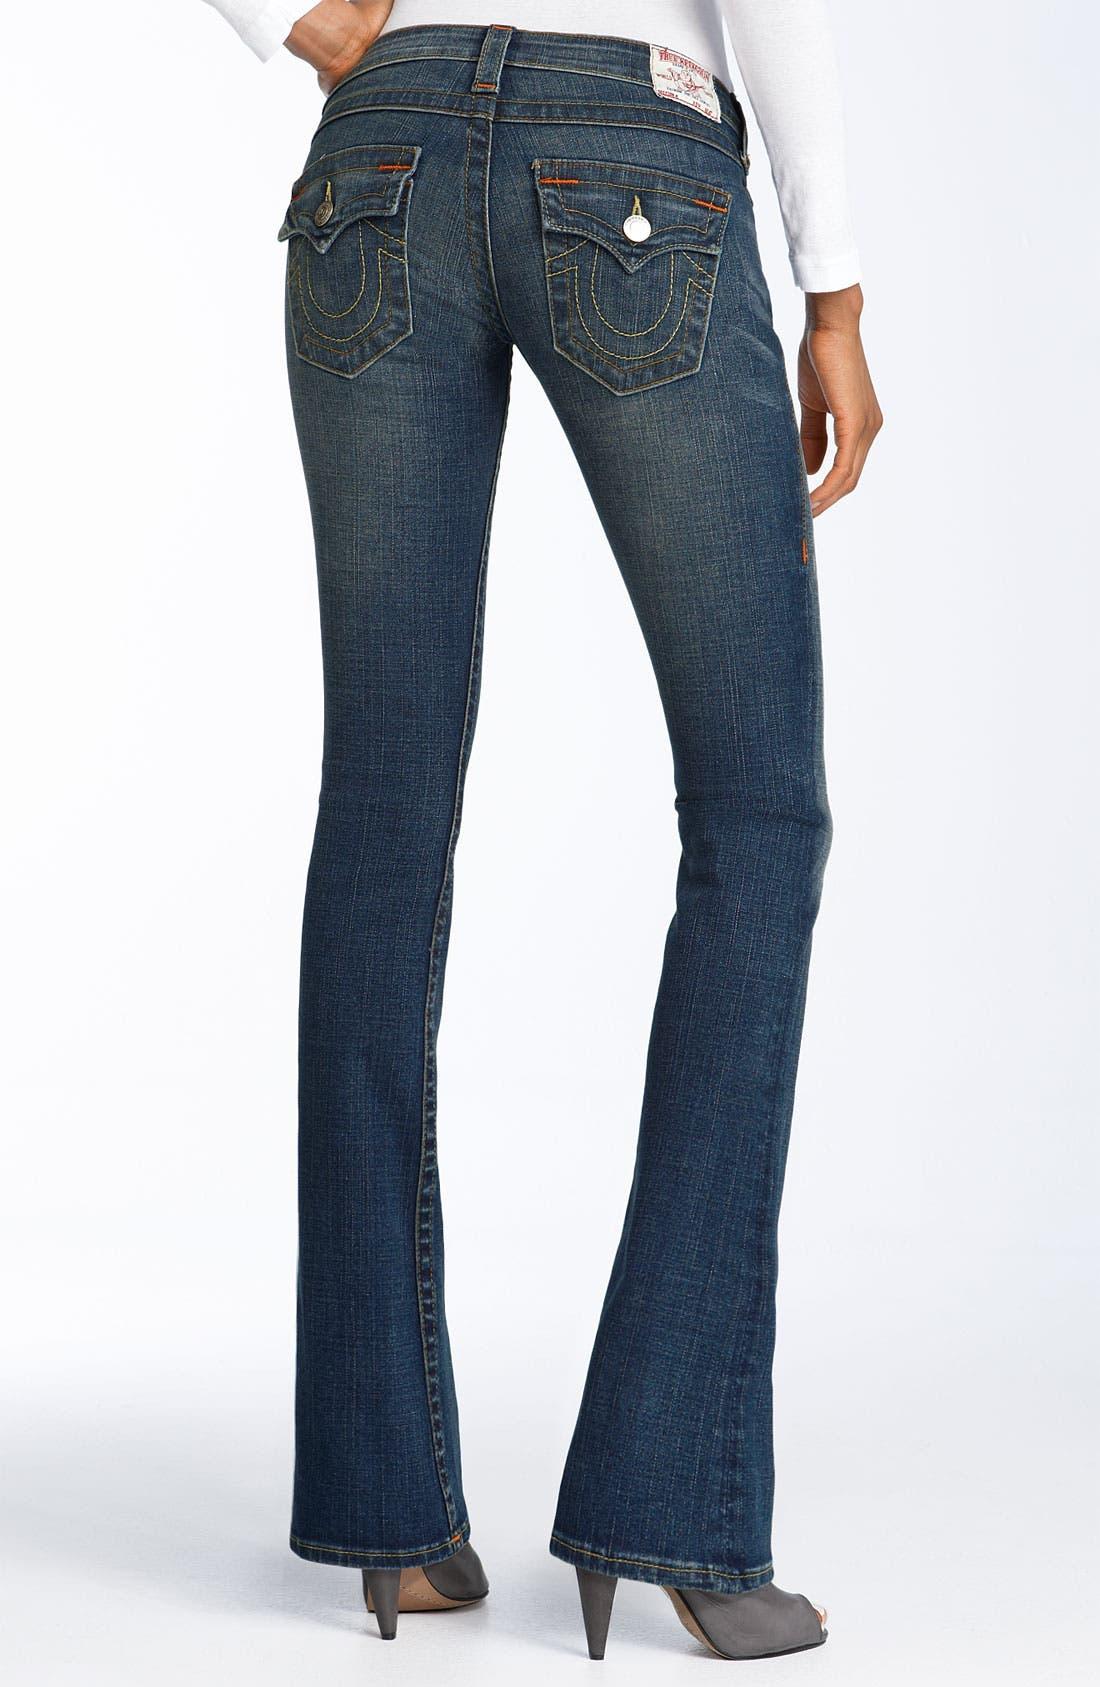 'Tony' Lean Bootcut Stretch Jeans,                             Main thumbnail 1, color,                             437